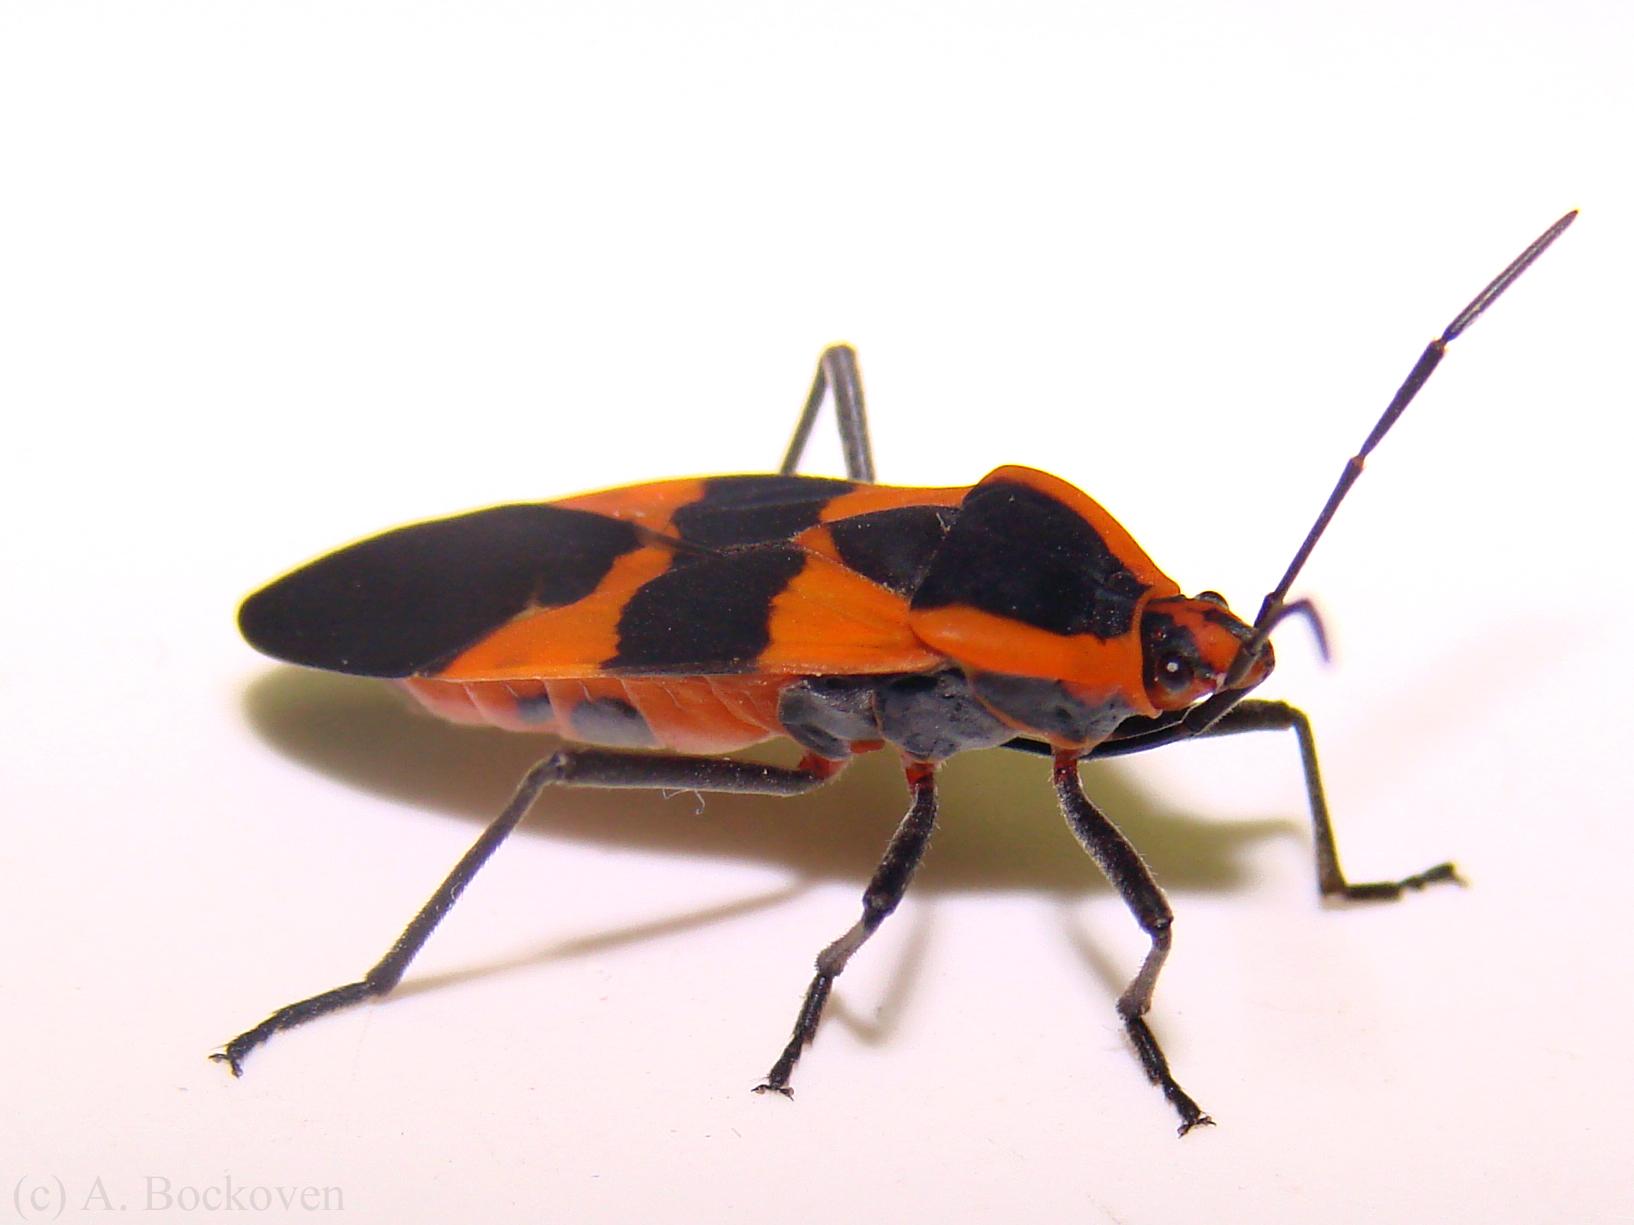 True bugs clipart #9